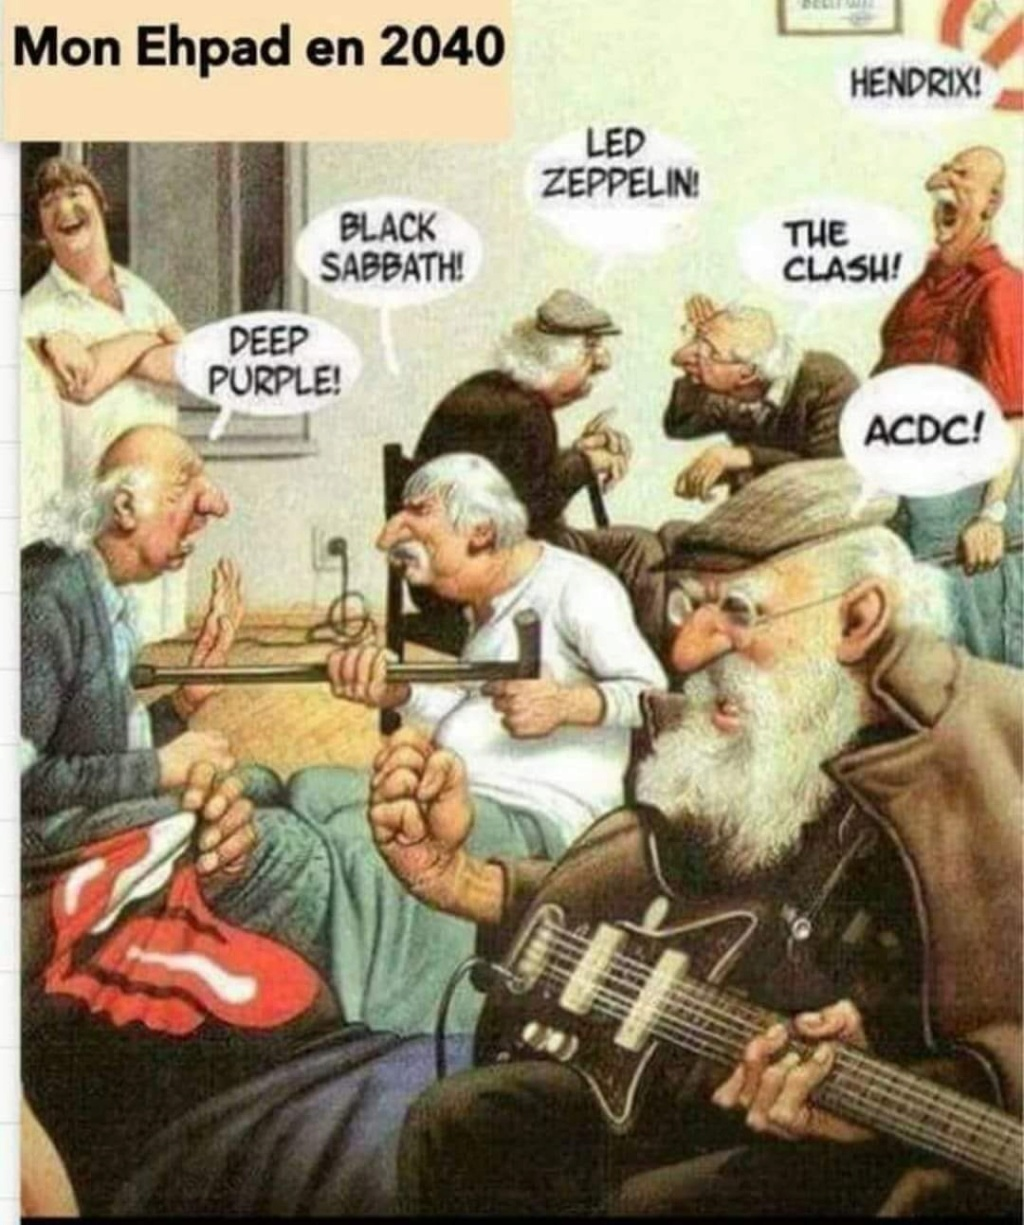 Humour en image du Forum Passion-Harley  ... - Page 4 16090010